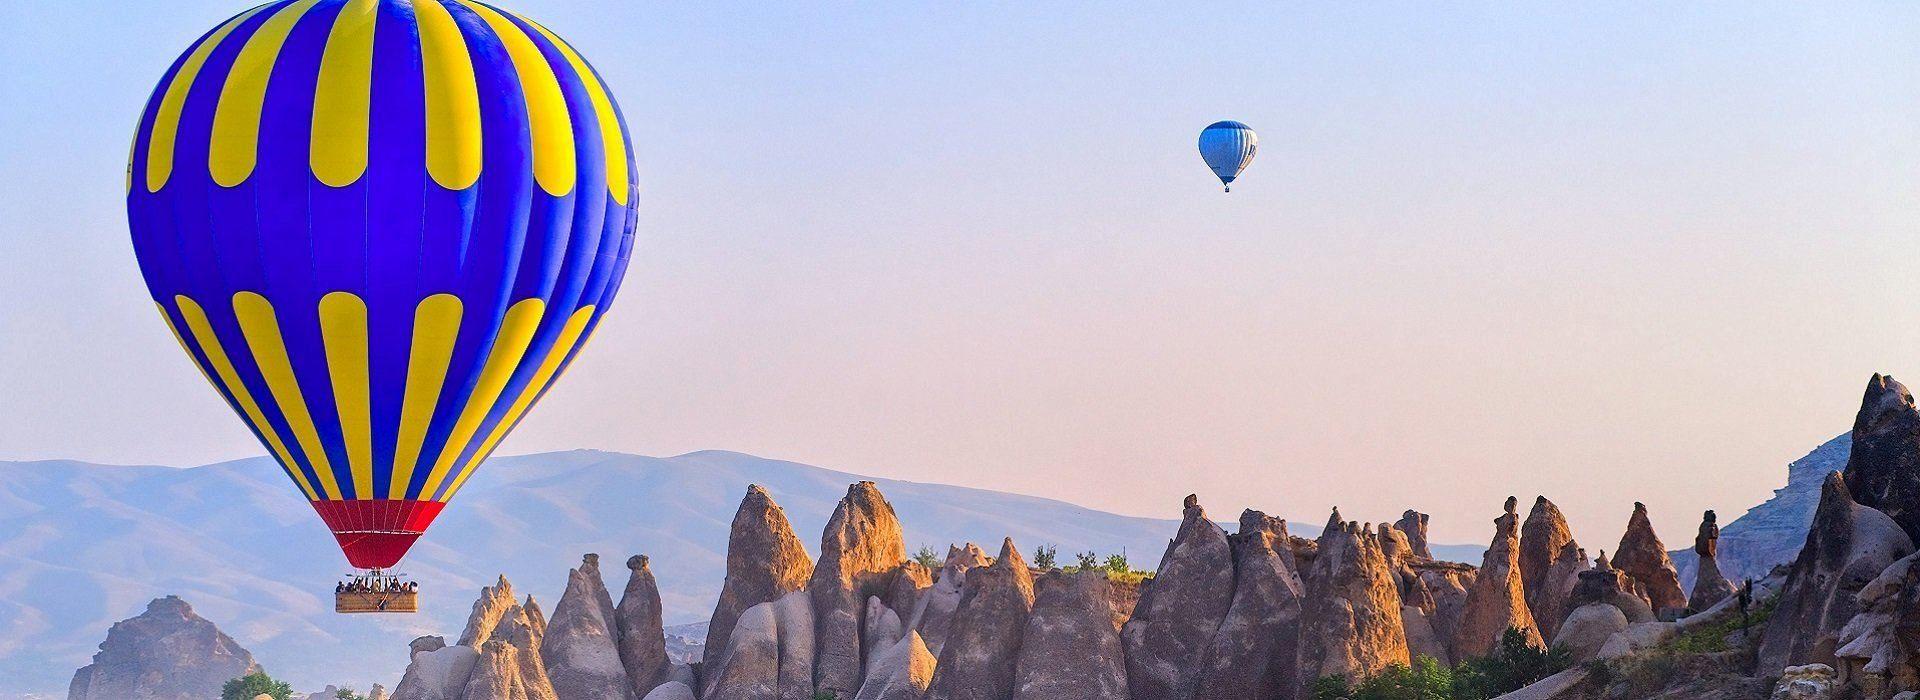 mongolfiera_cappadocia